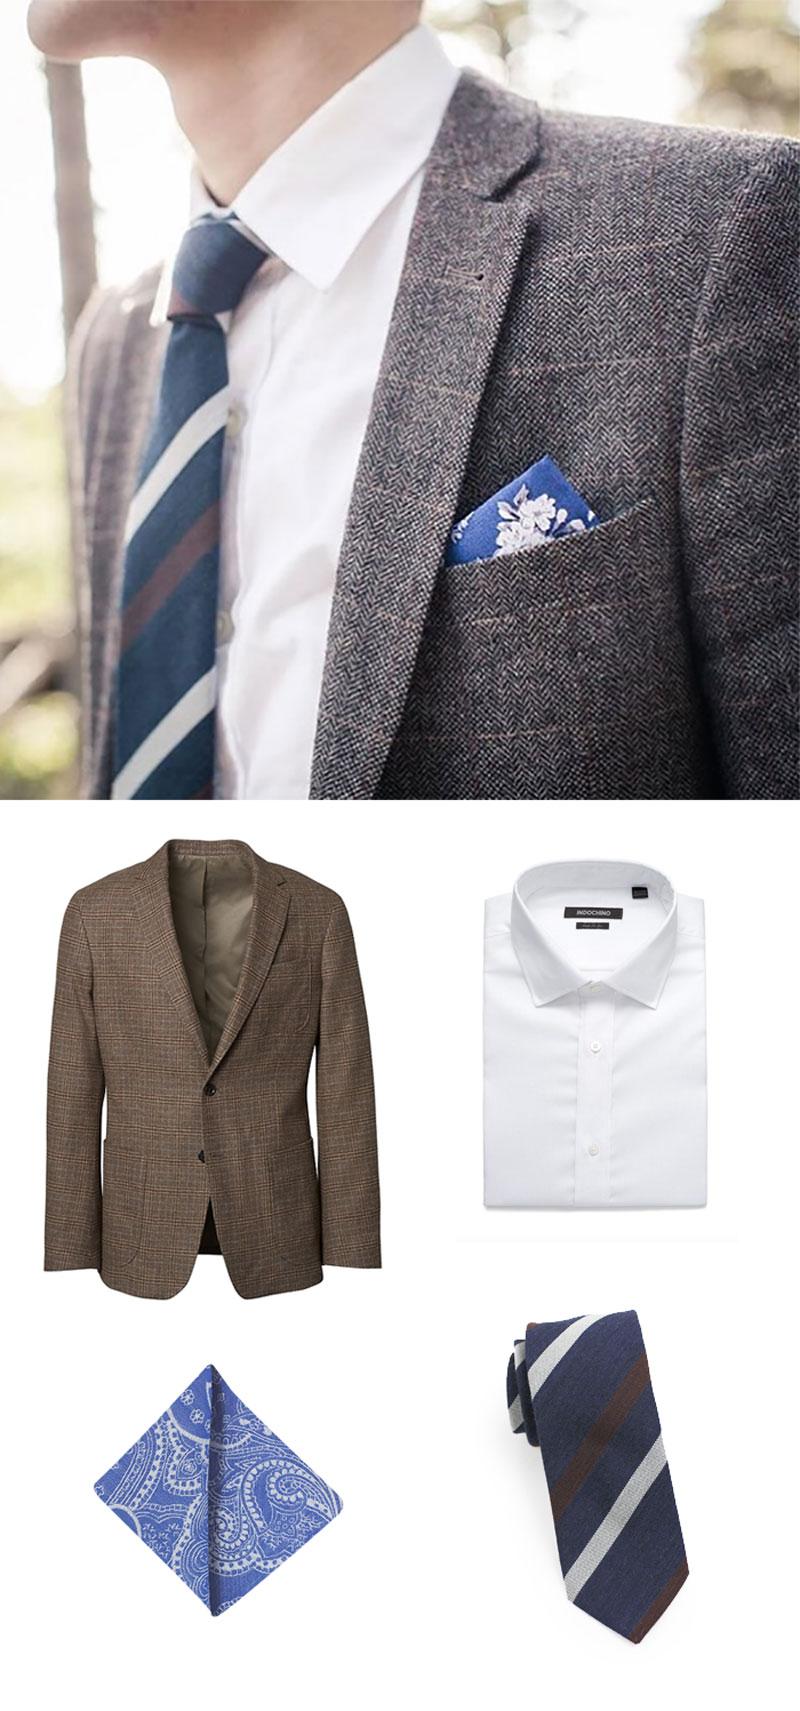 Mens Fall Fashion - Brown Wool Check Jacket